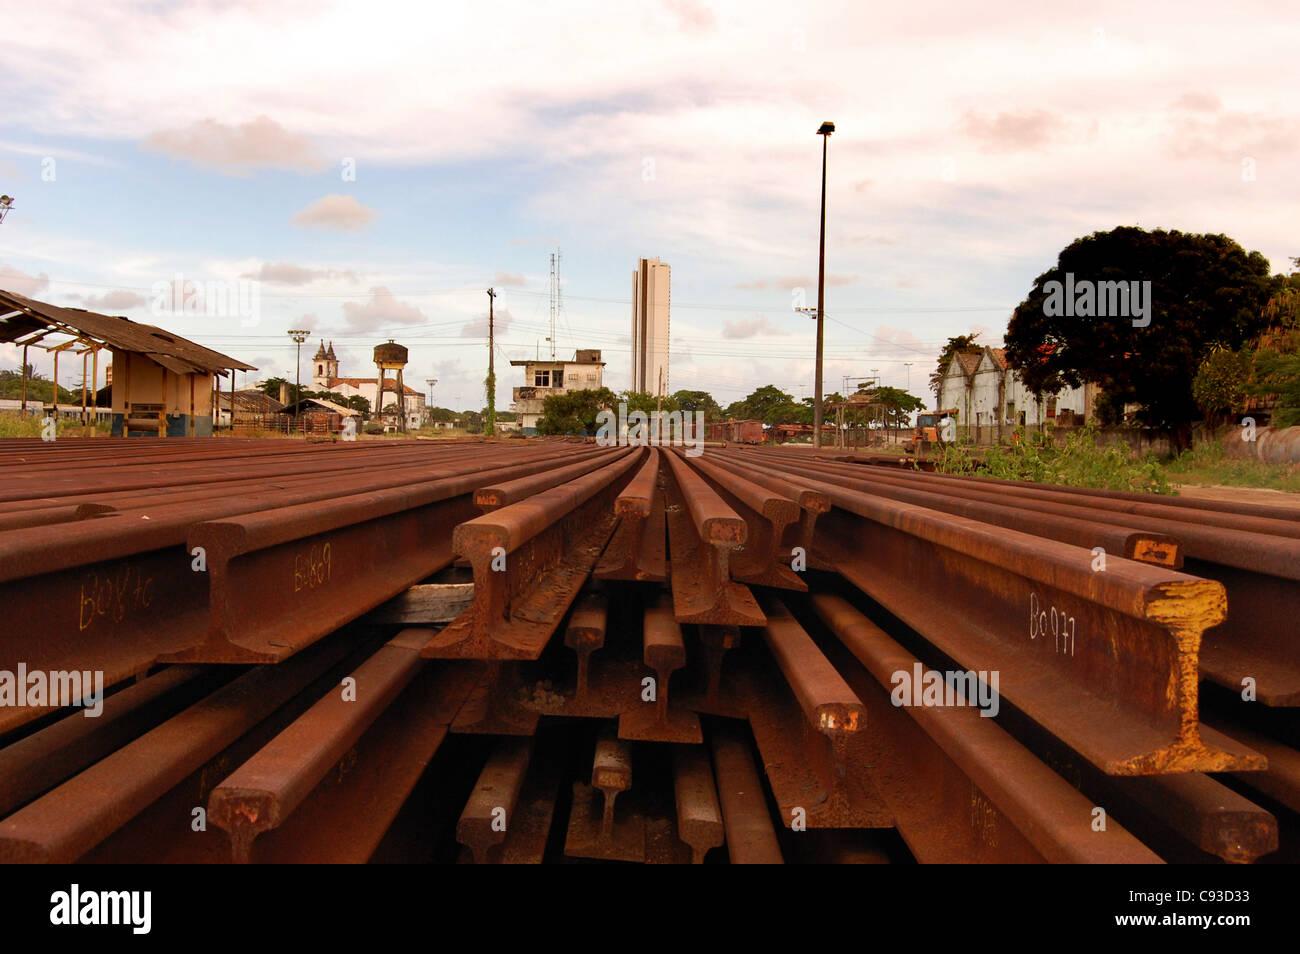 Cais José Estilita, Recife, Brazil. Major terminus of the Northeast declining railway system. - Stock Image